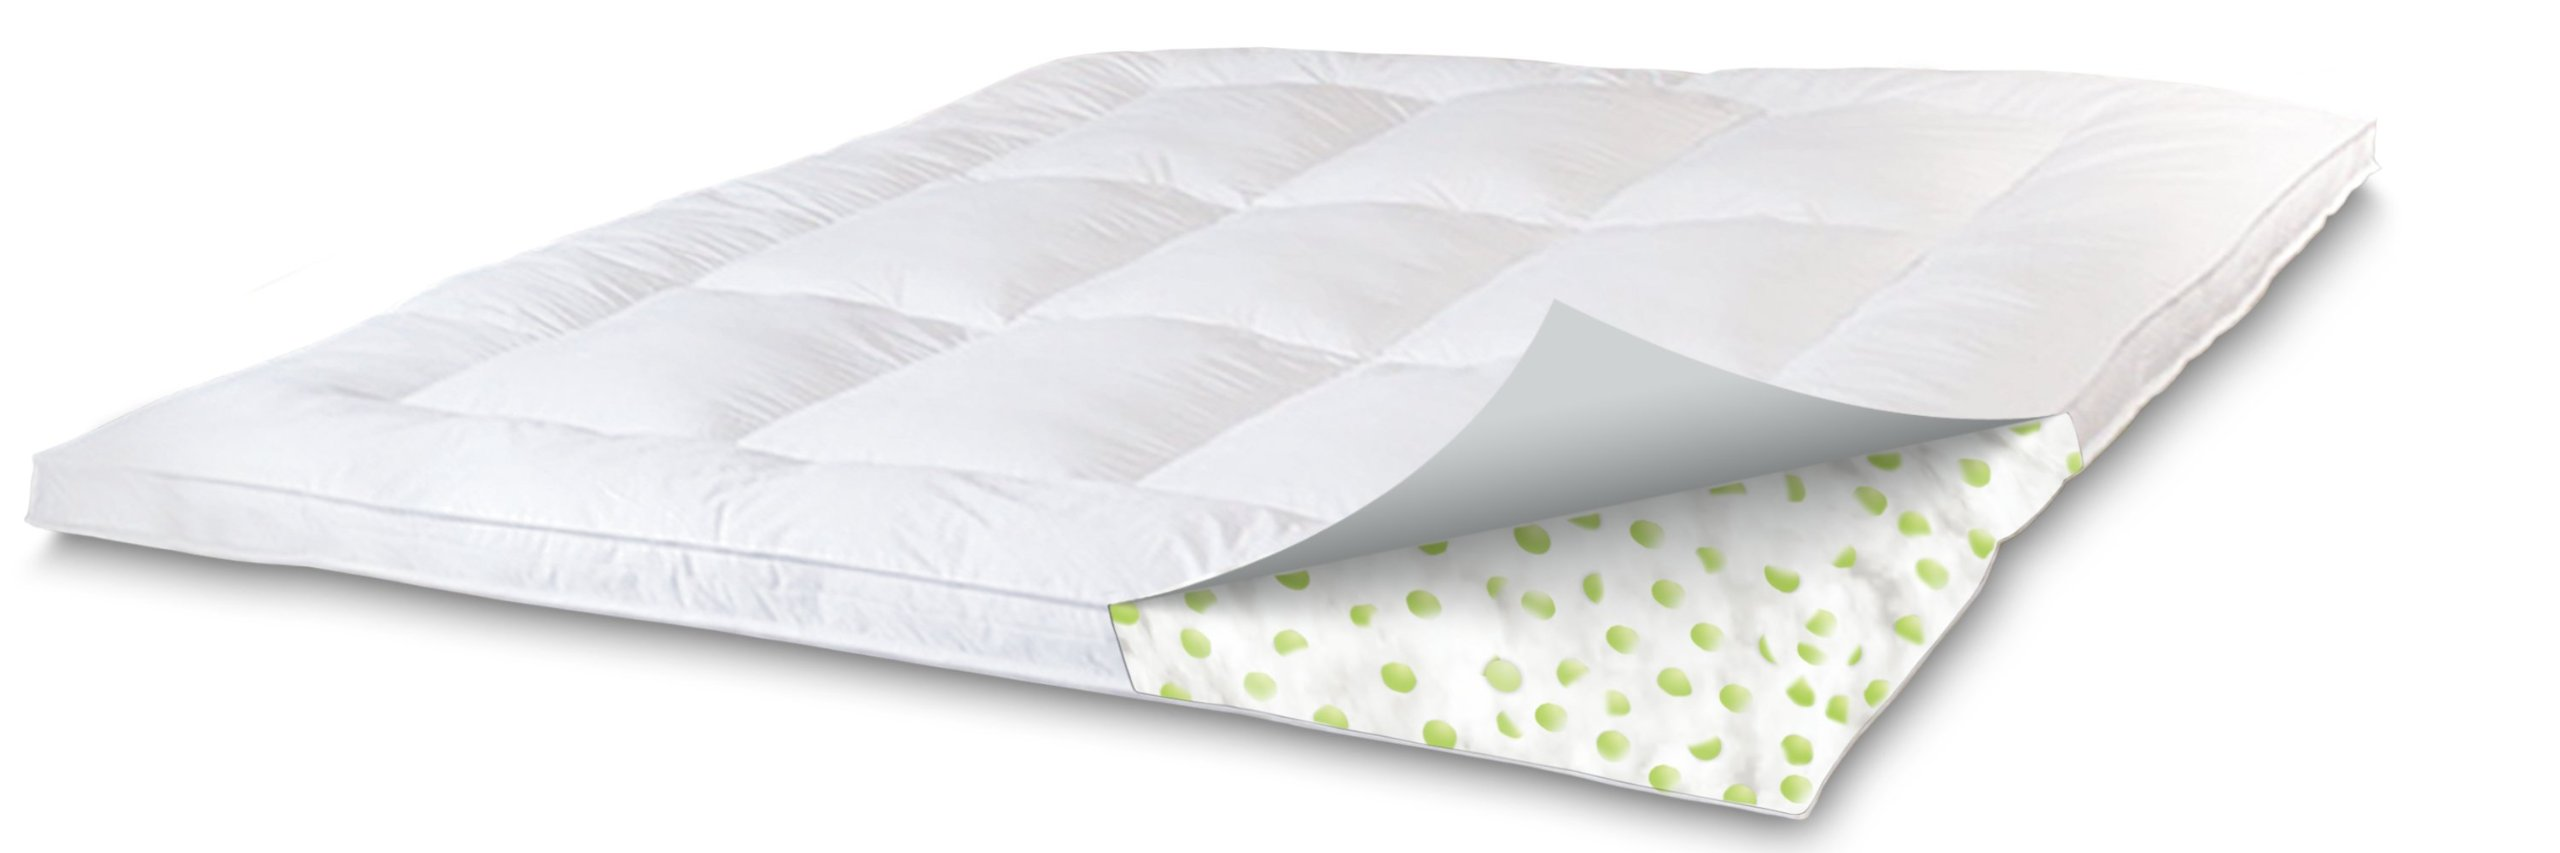 SensorPEDIC Memory Loft Classic 2.5-Inch Memory Foam/Fiber Bed Mattress Topper King Size, White